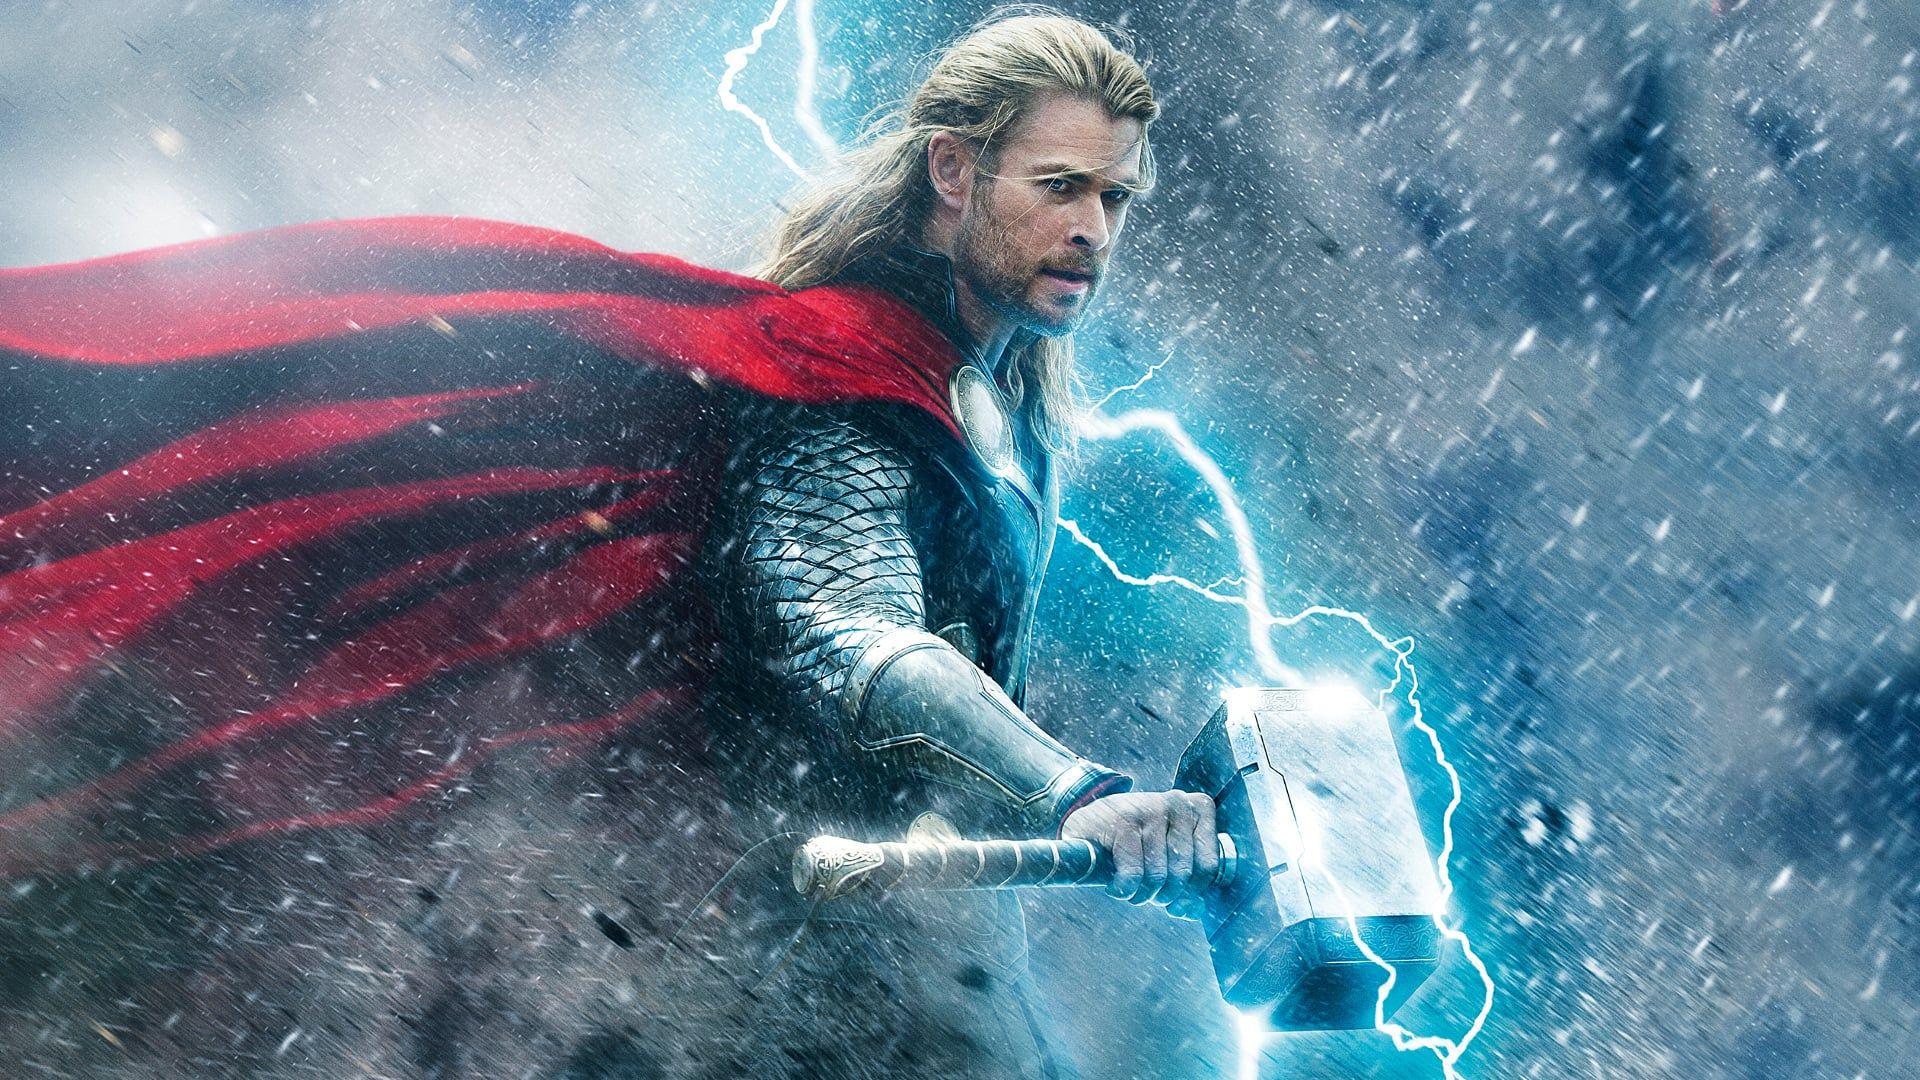 Hd Mozi Thor Sötét Világ 2013 Online Teljes Film Filmek Magyarul Letöltés Hd Thor Sötét Világ 2013 Teljes Film Magyarul Onl The Dark World Watch Thor Thor